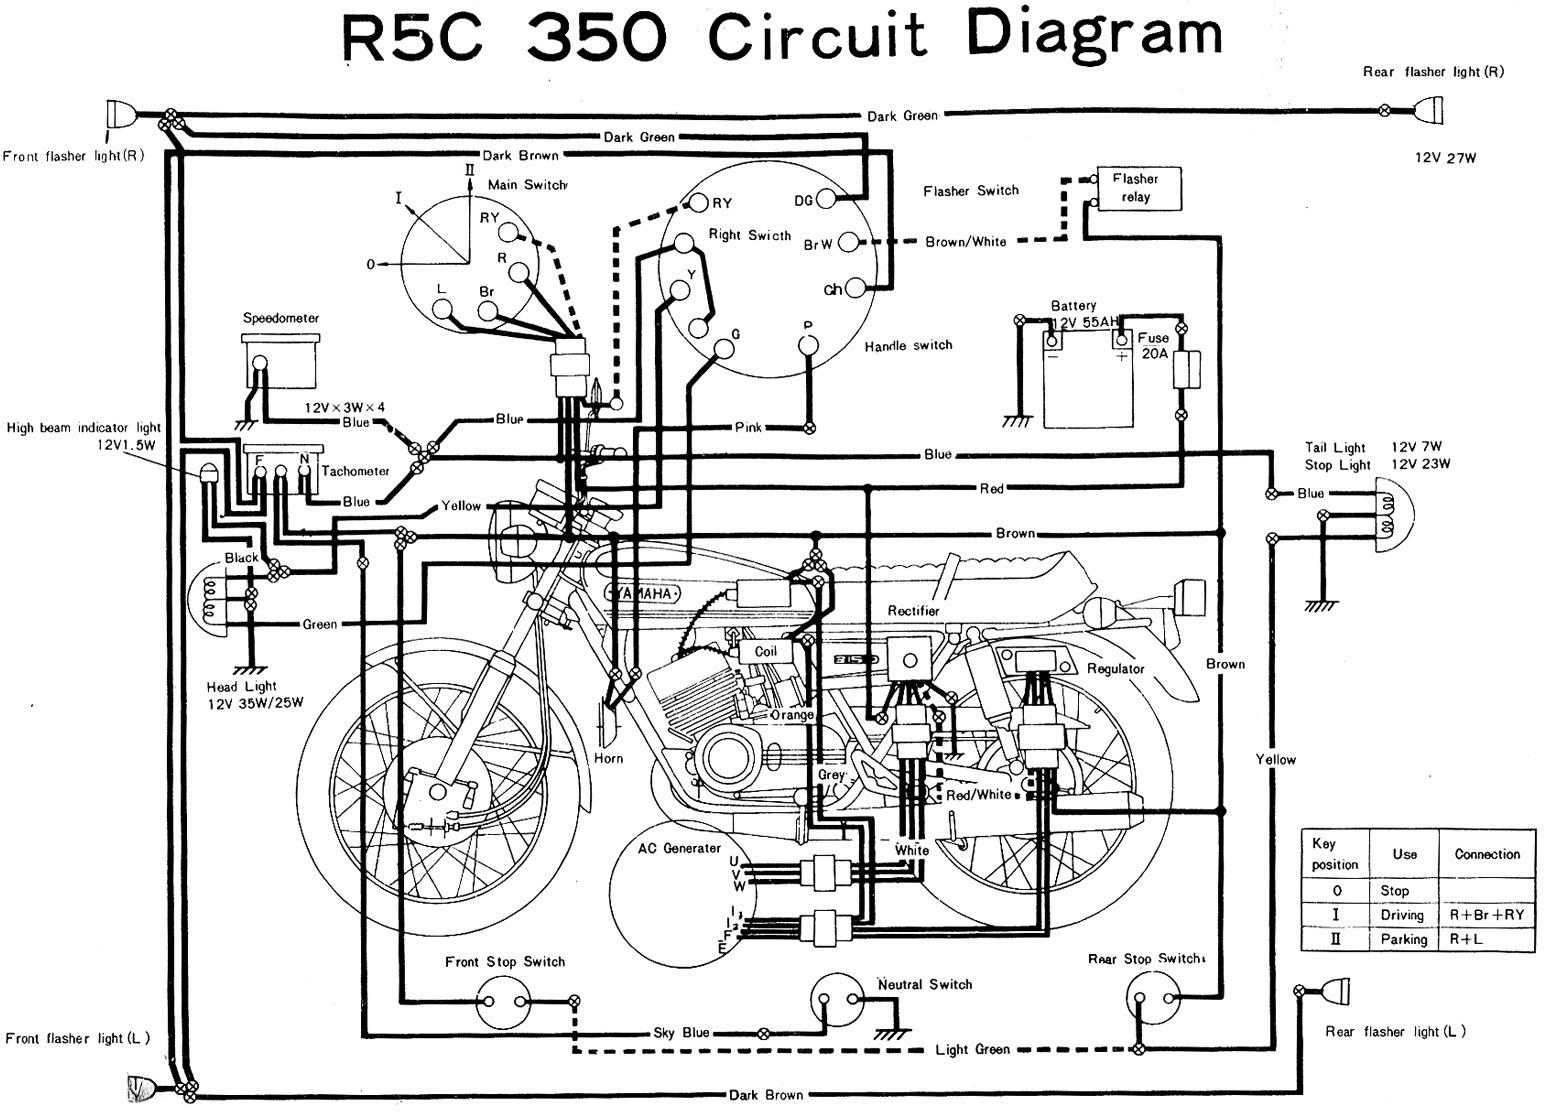 Diagram Yamaha Fzr400 Fzr400suc Wiring Diagram Evan Fell Motorcycle Works Full Version Hd Quality Motorcycle Works Carmotorwiring Creasitionline It